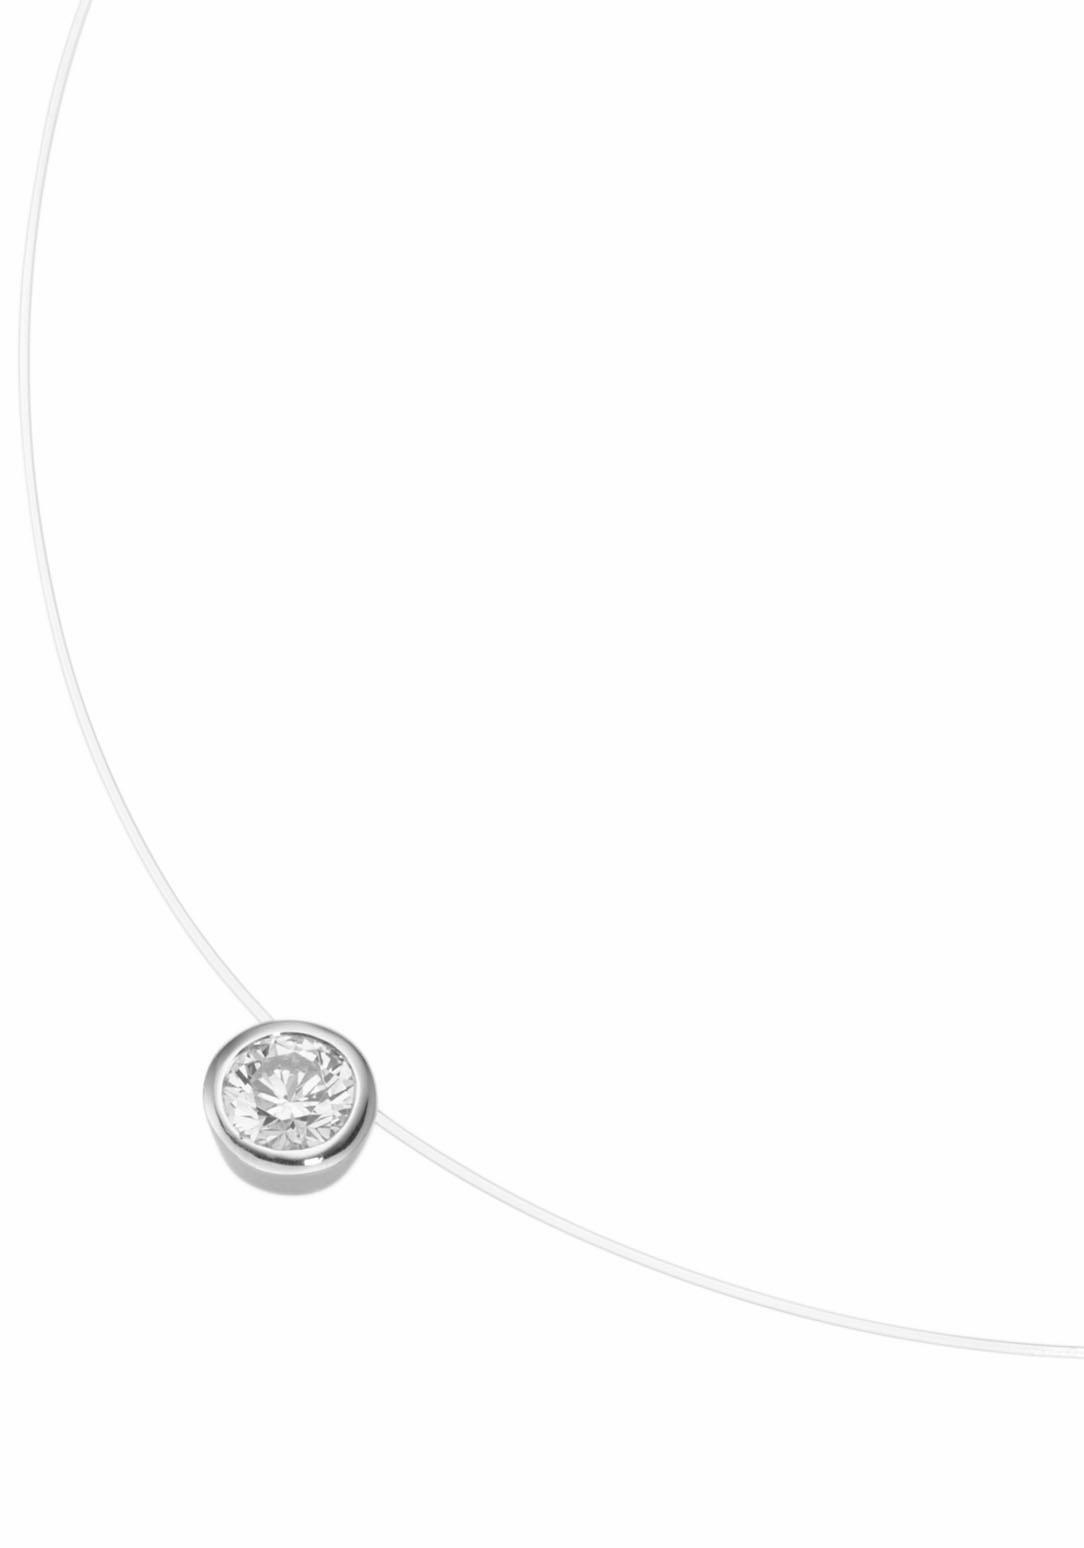 Firetti Kette mit Anhänger Solitär | Schmuck > Halsketten > Ketten mit Anhänger | Firetti